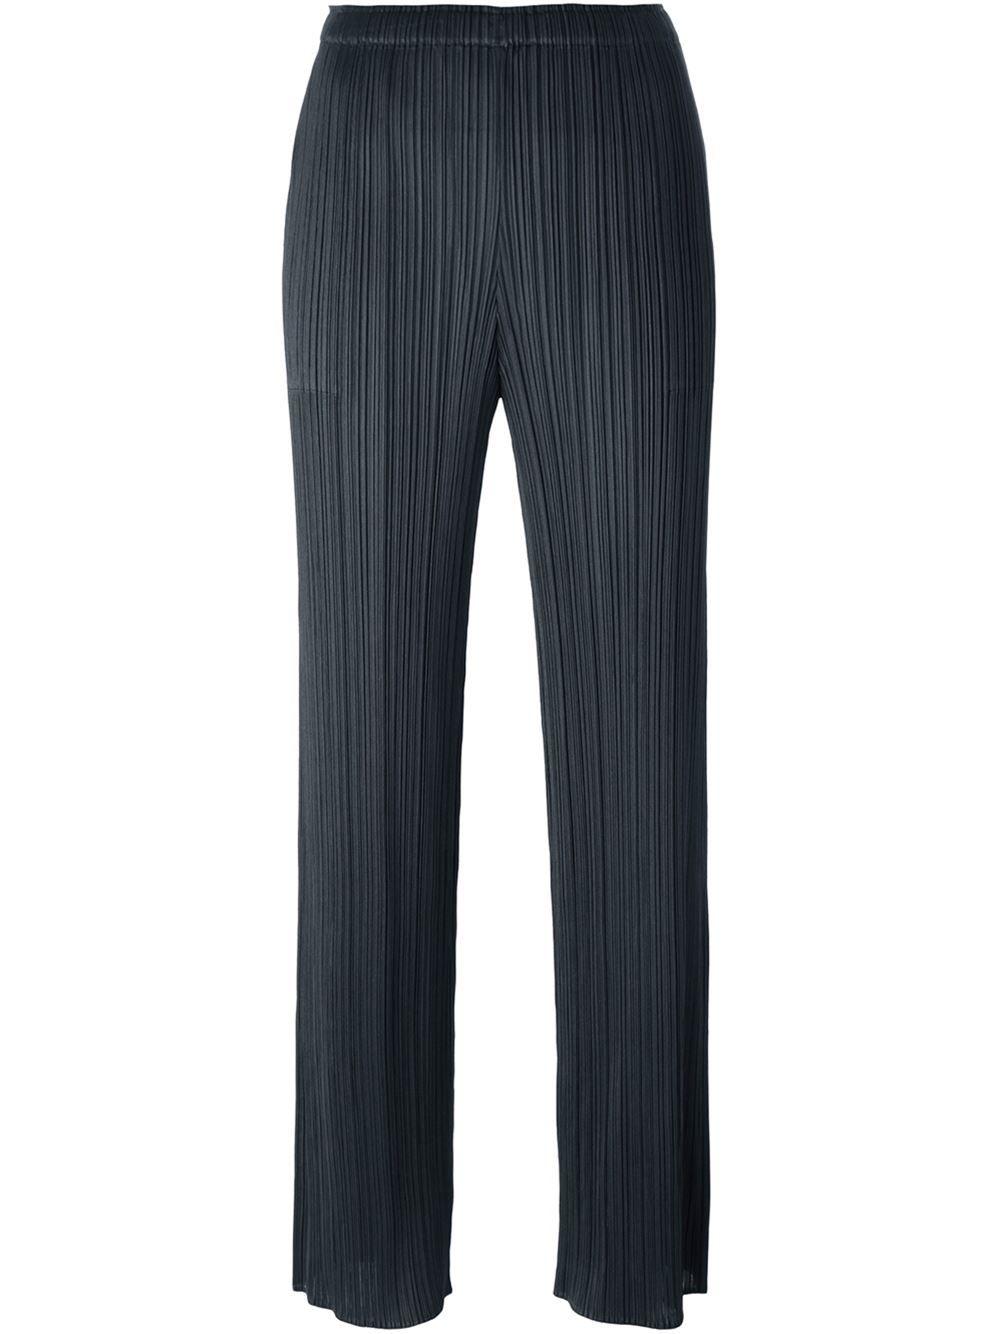 Pleats Please By Issey Miyake Pantalon Droit A Design Plisse Farfetch Com Style Du Japon Pantalon Taille Haute Pantalon